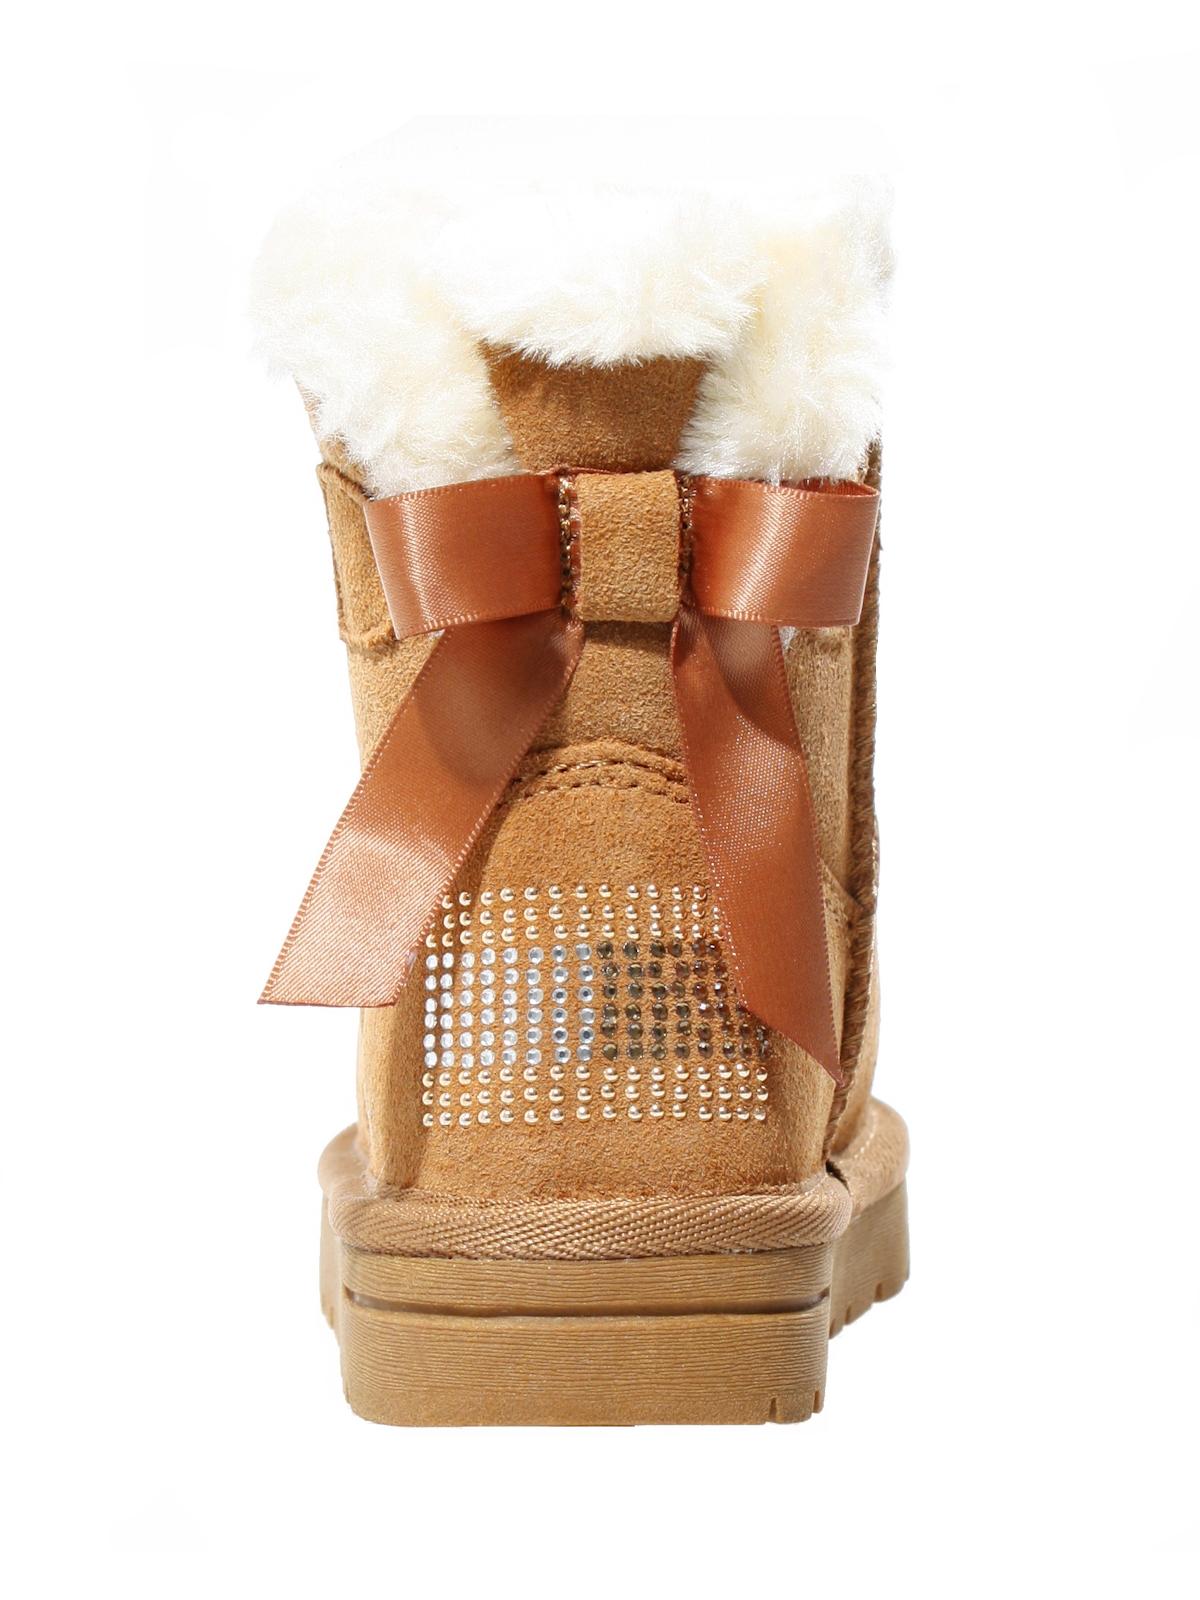 422a5ad696 Tommy Hilfiger Kinder Boots Winter Stiefel Schuhe für Mädchen Lammfell  Leder 4